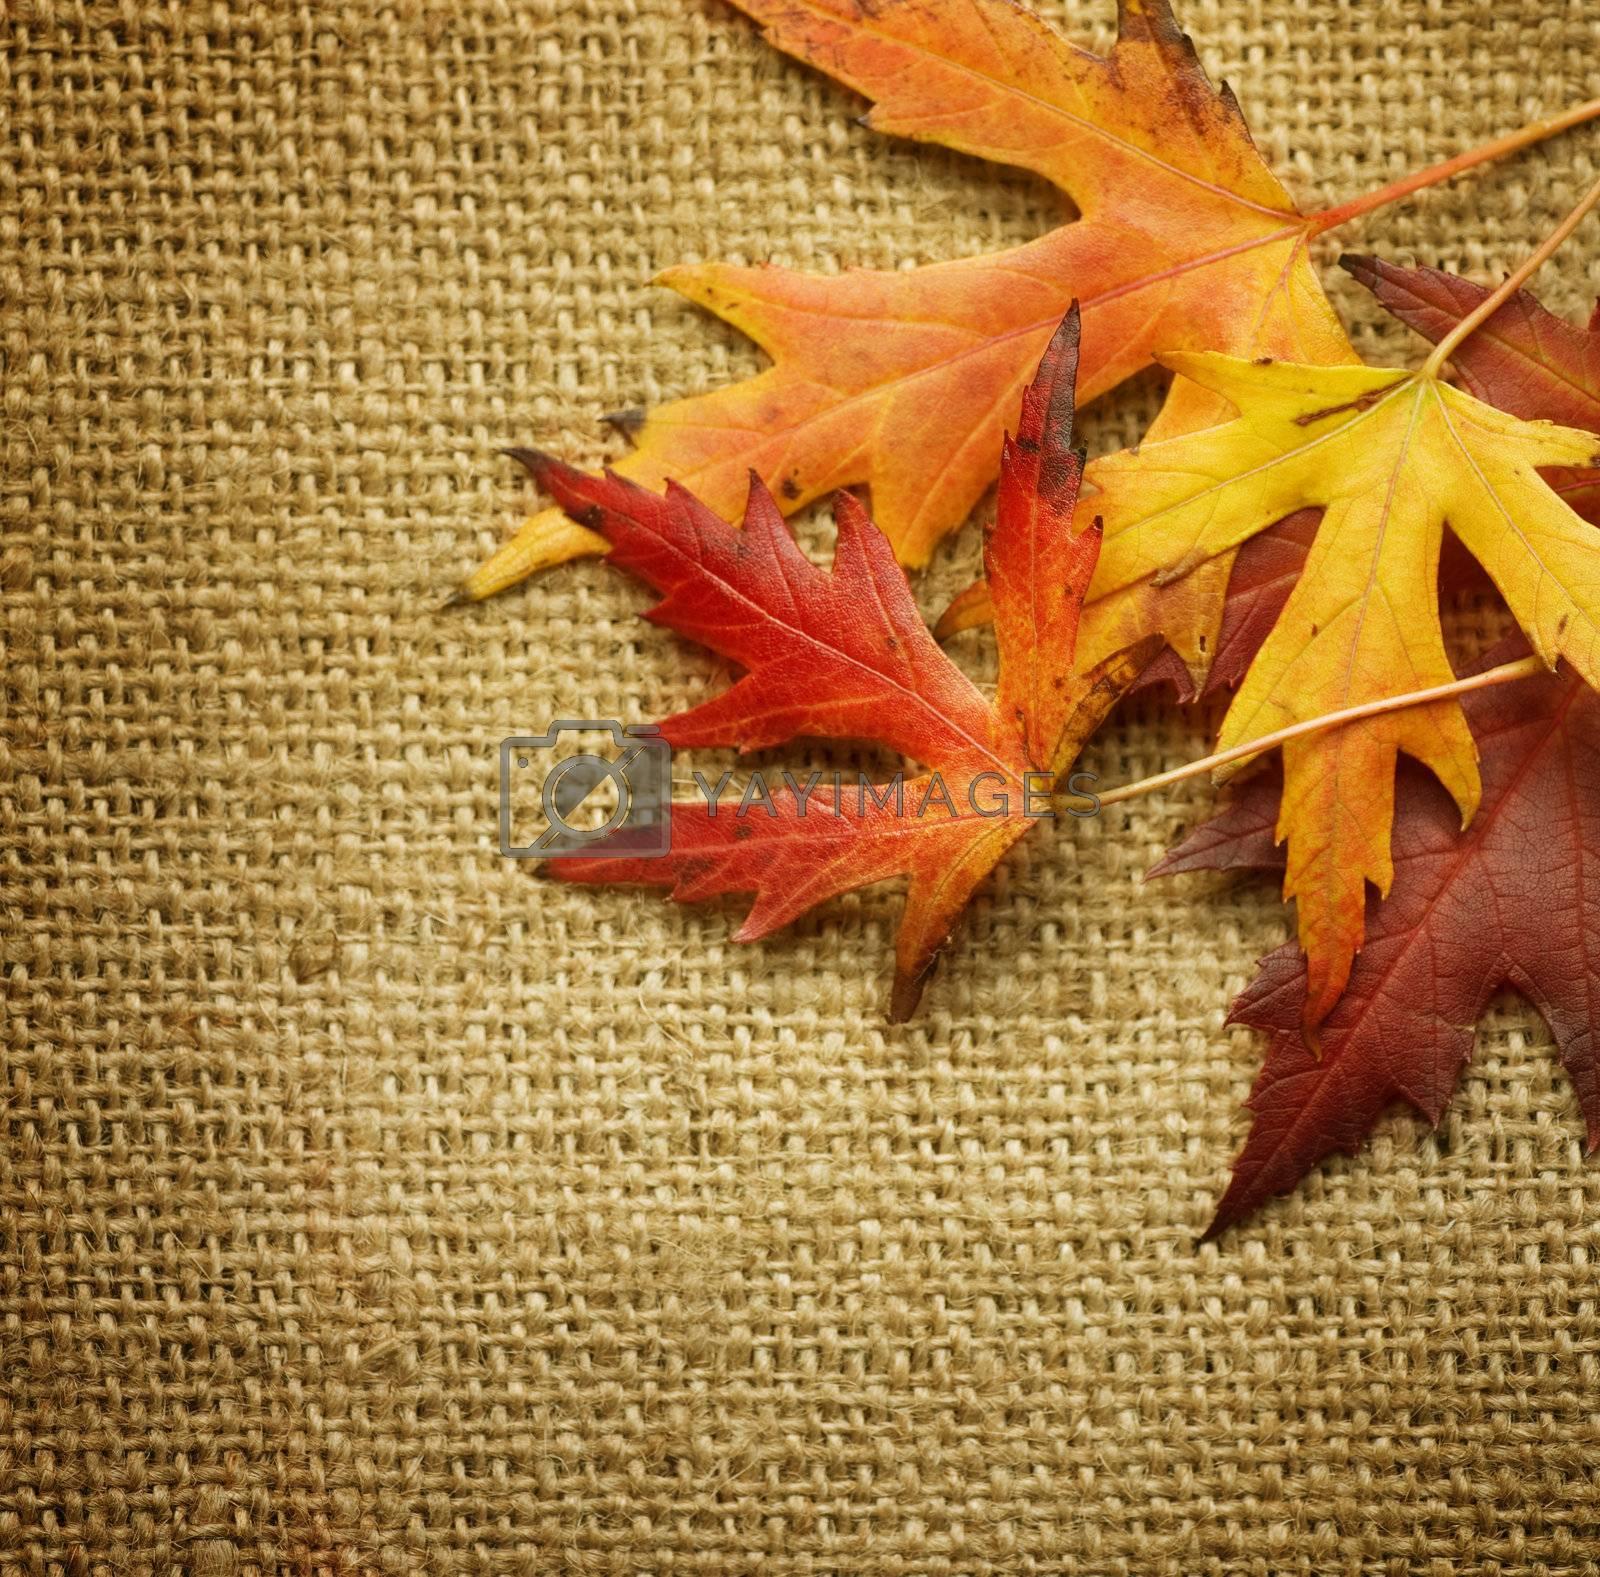 Autumn Leaves over Burlap background